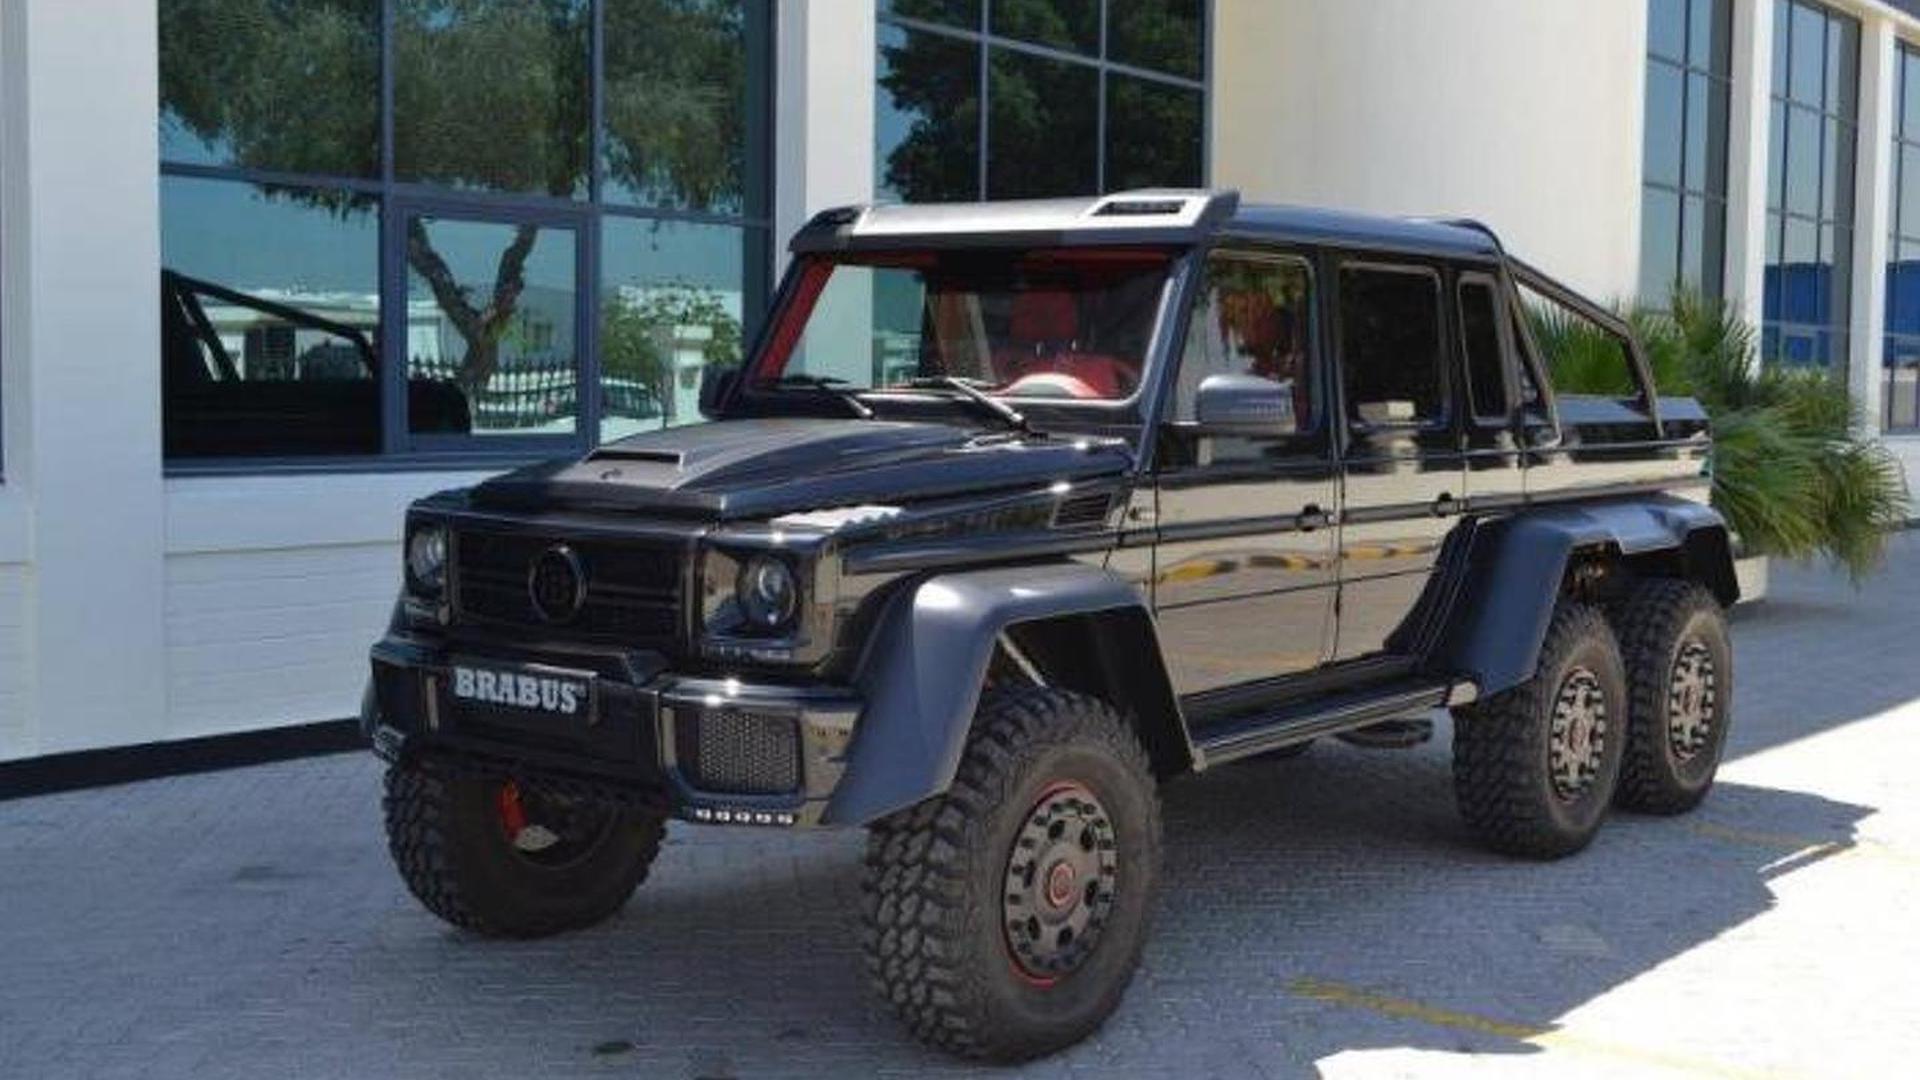 Brabus B63S 700 6x6 shows its metal in Dubai